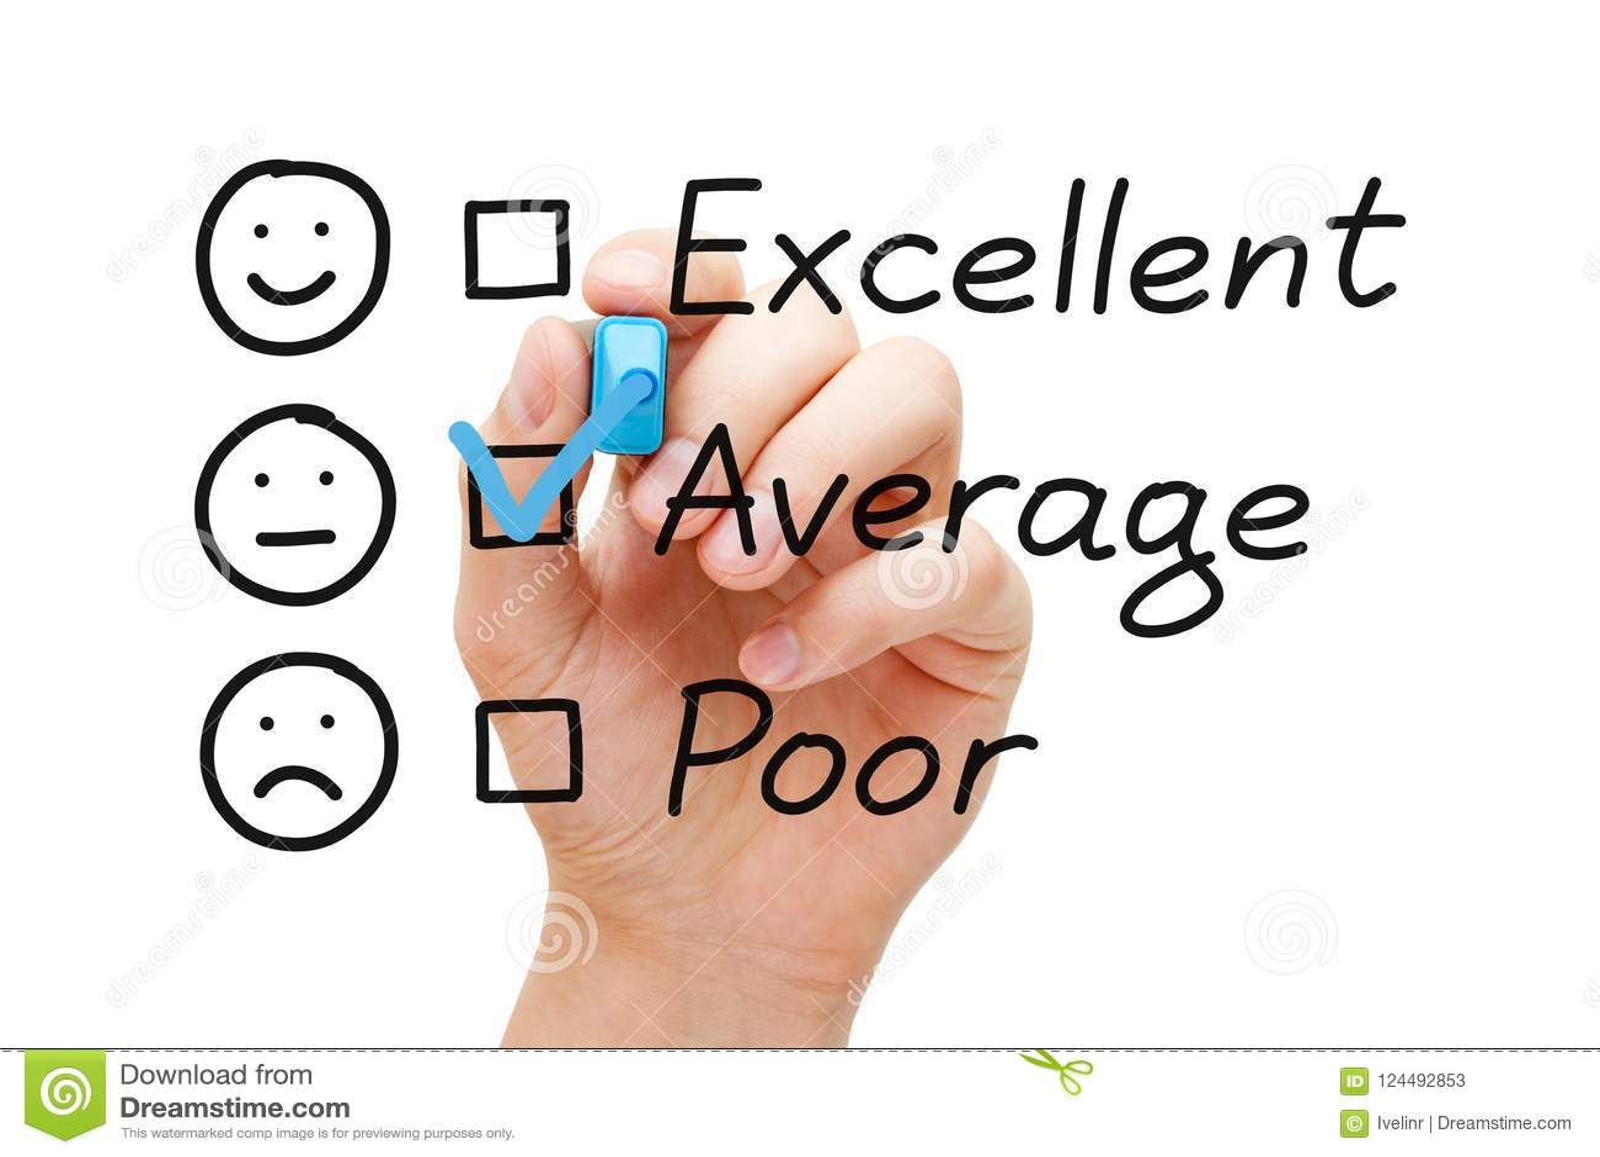 Average Customer Service Evaluation Form